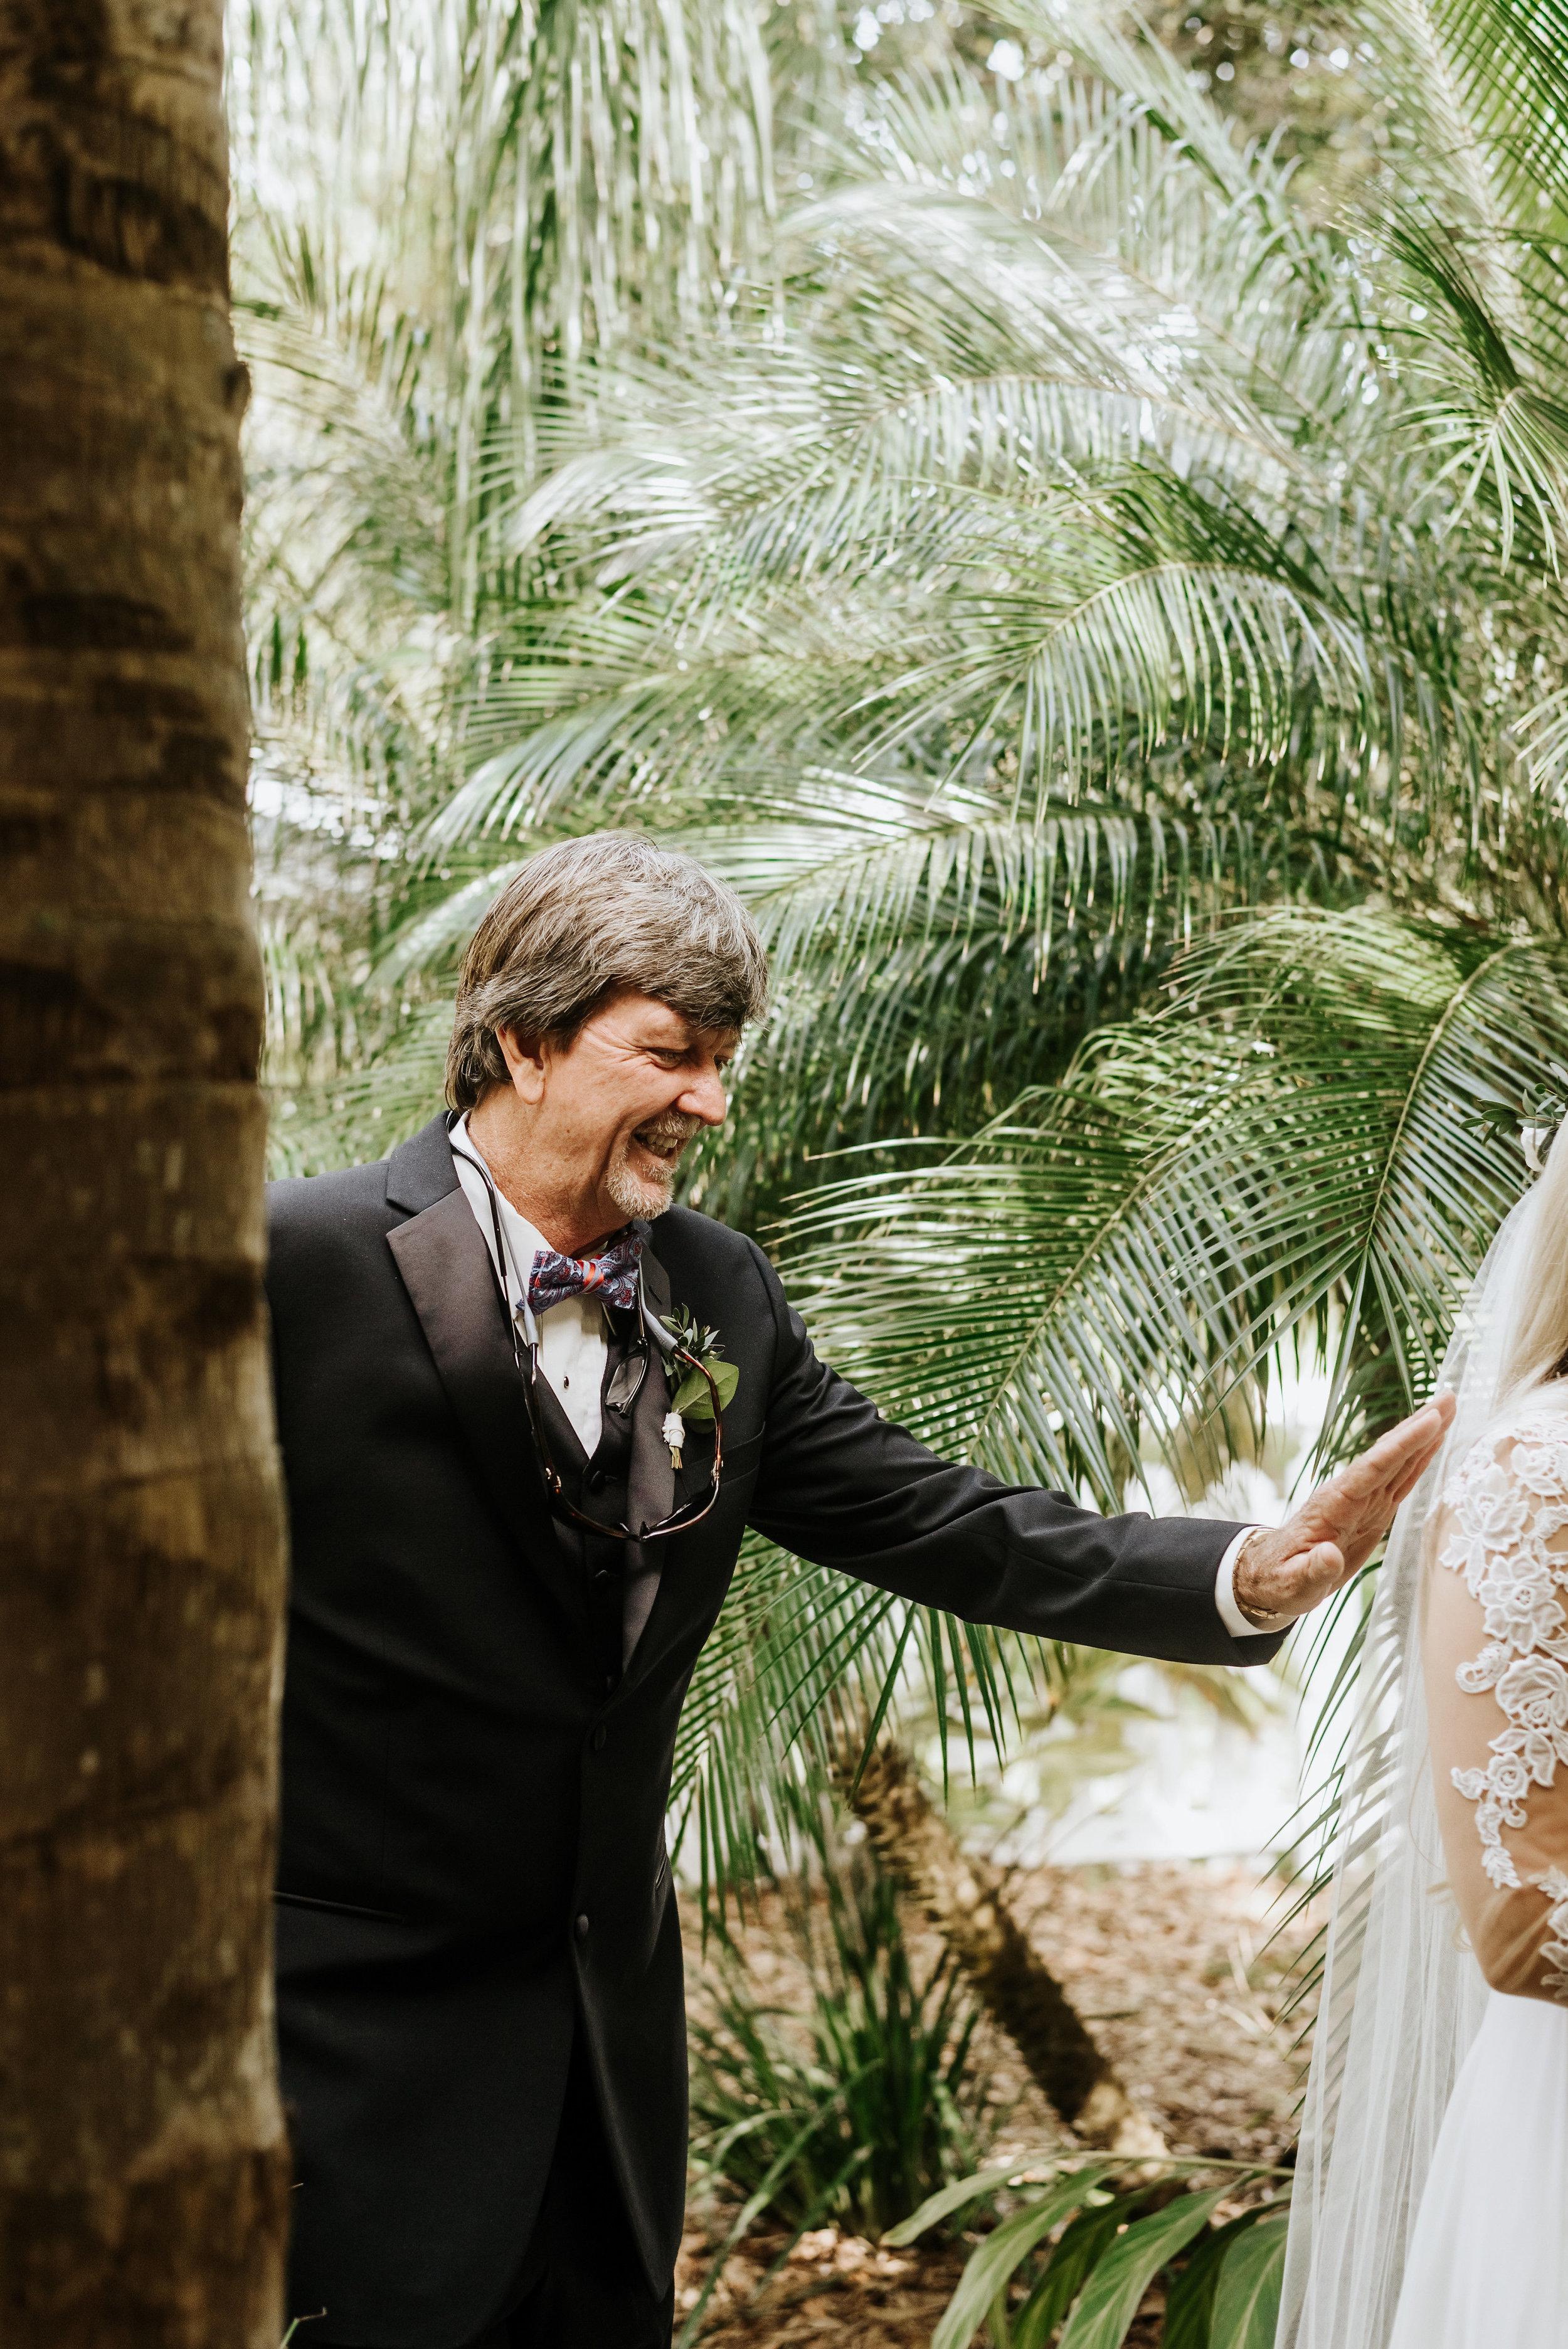 Mikenzi_Brad_Wedding_The_Delamater_House_New_Smyrna_Beach_Florida_Photography_by_V_4575.jpg